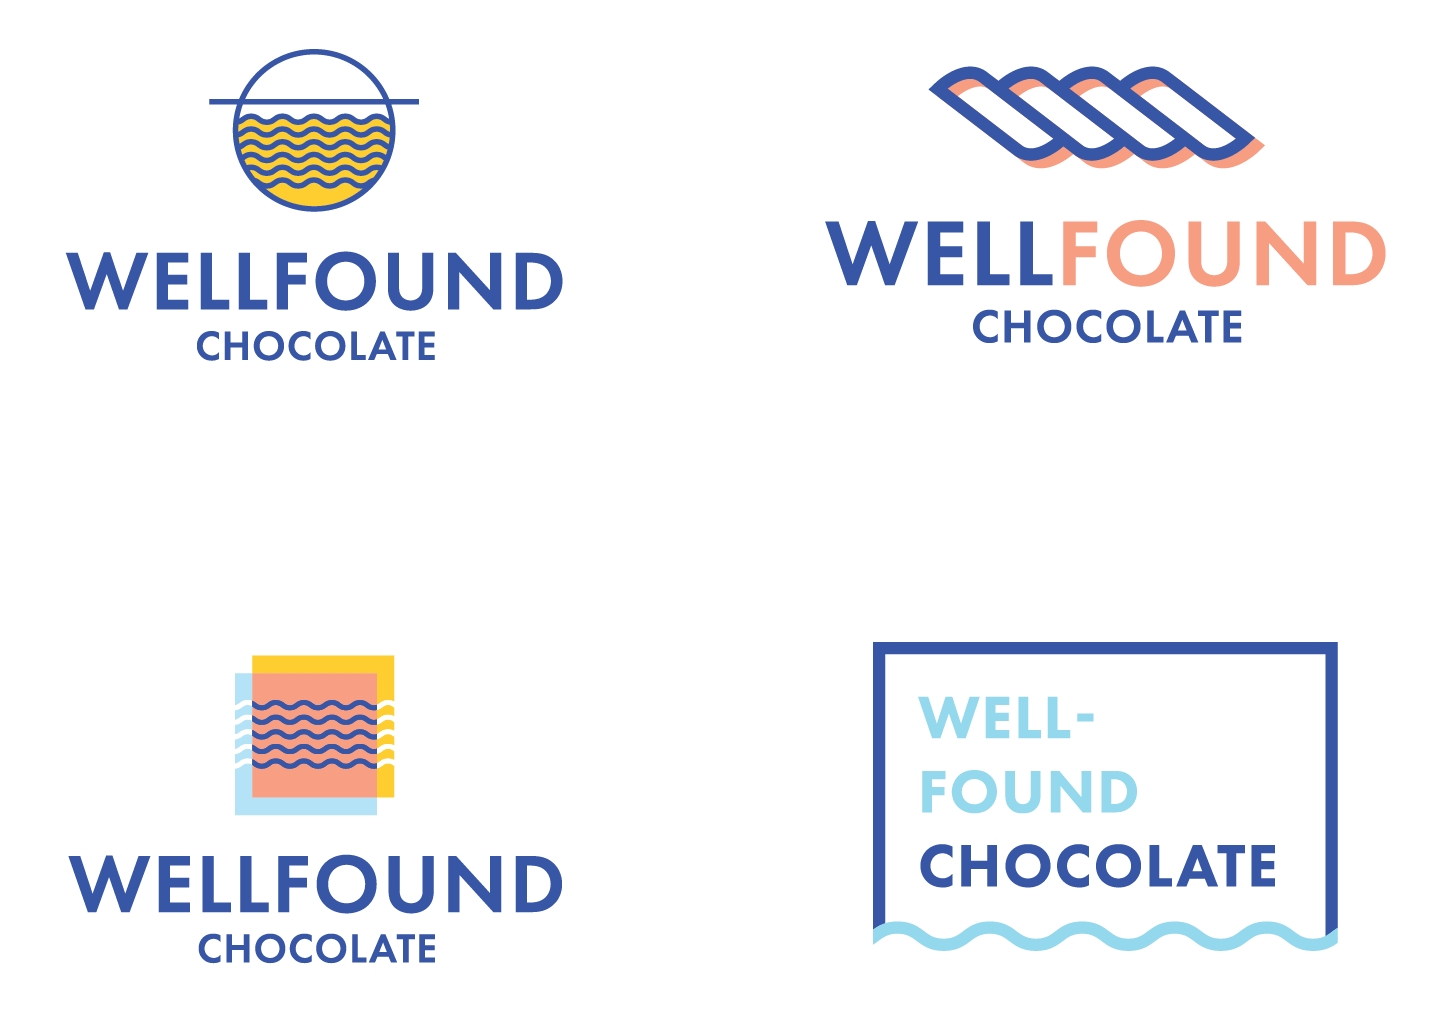 Wellfound-R1Logos